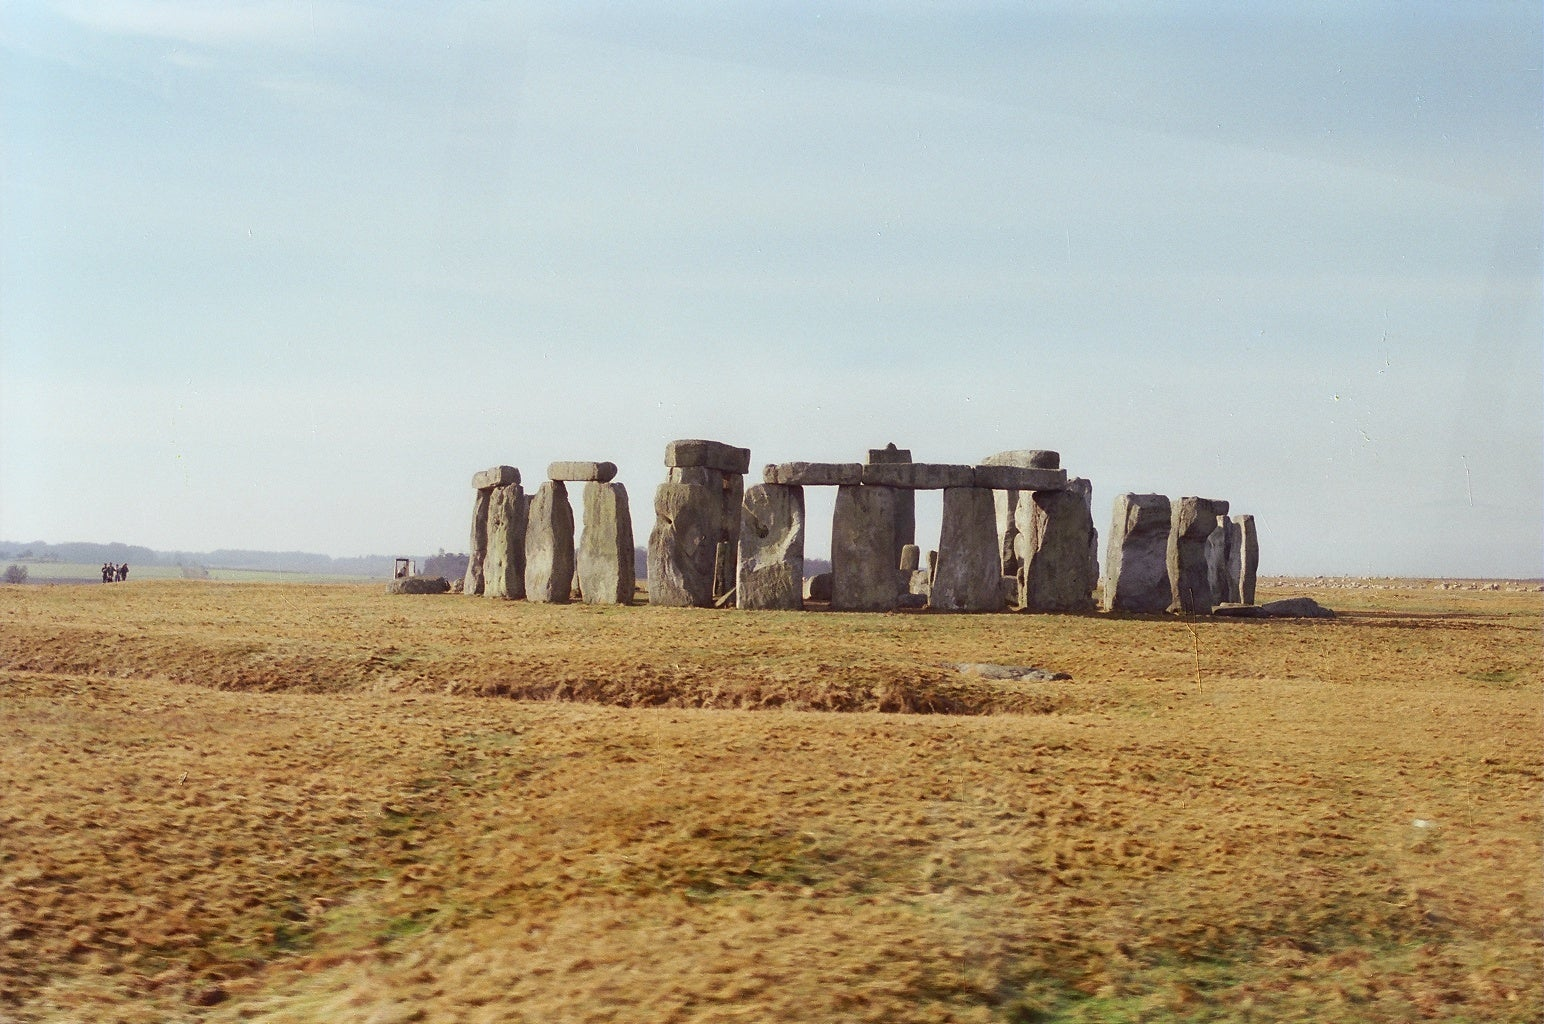 'Superhenge' Site Excavation Reveals No Stones